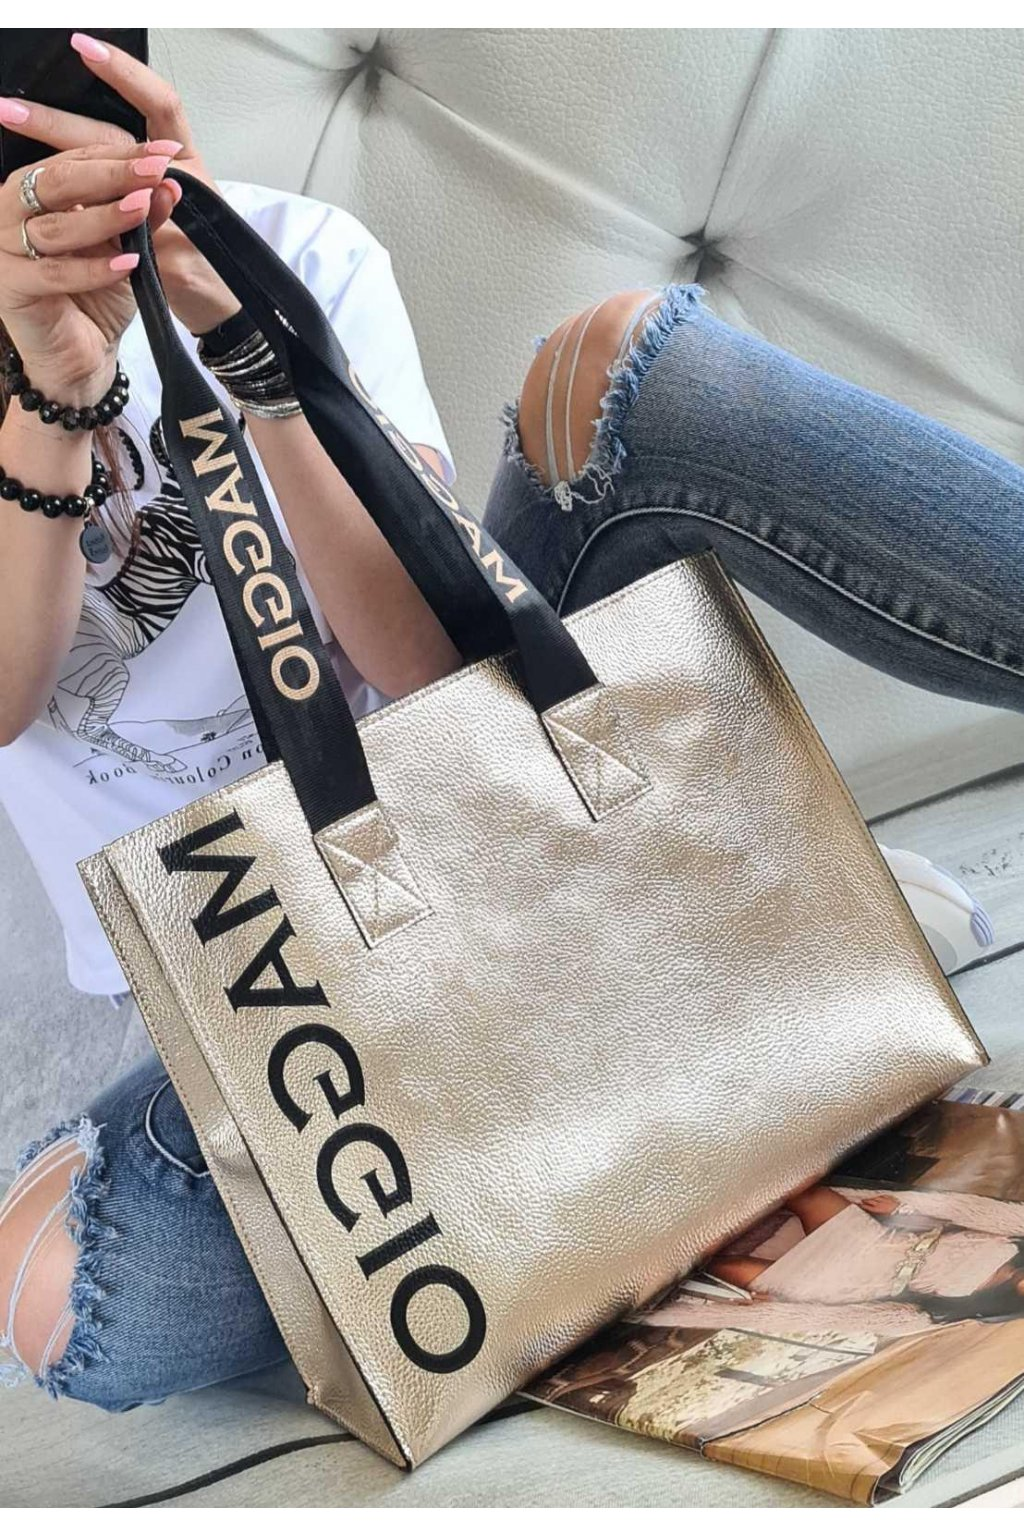 MAGIO zlatá kabelka trendy eko kůže koženka italy style tip na dárek